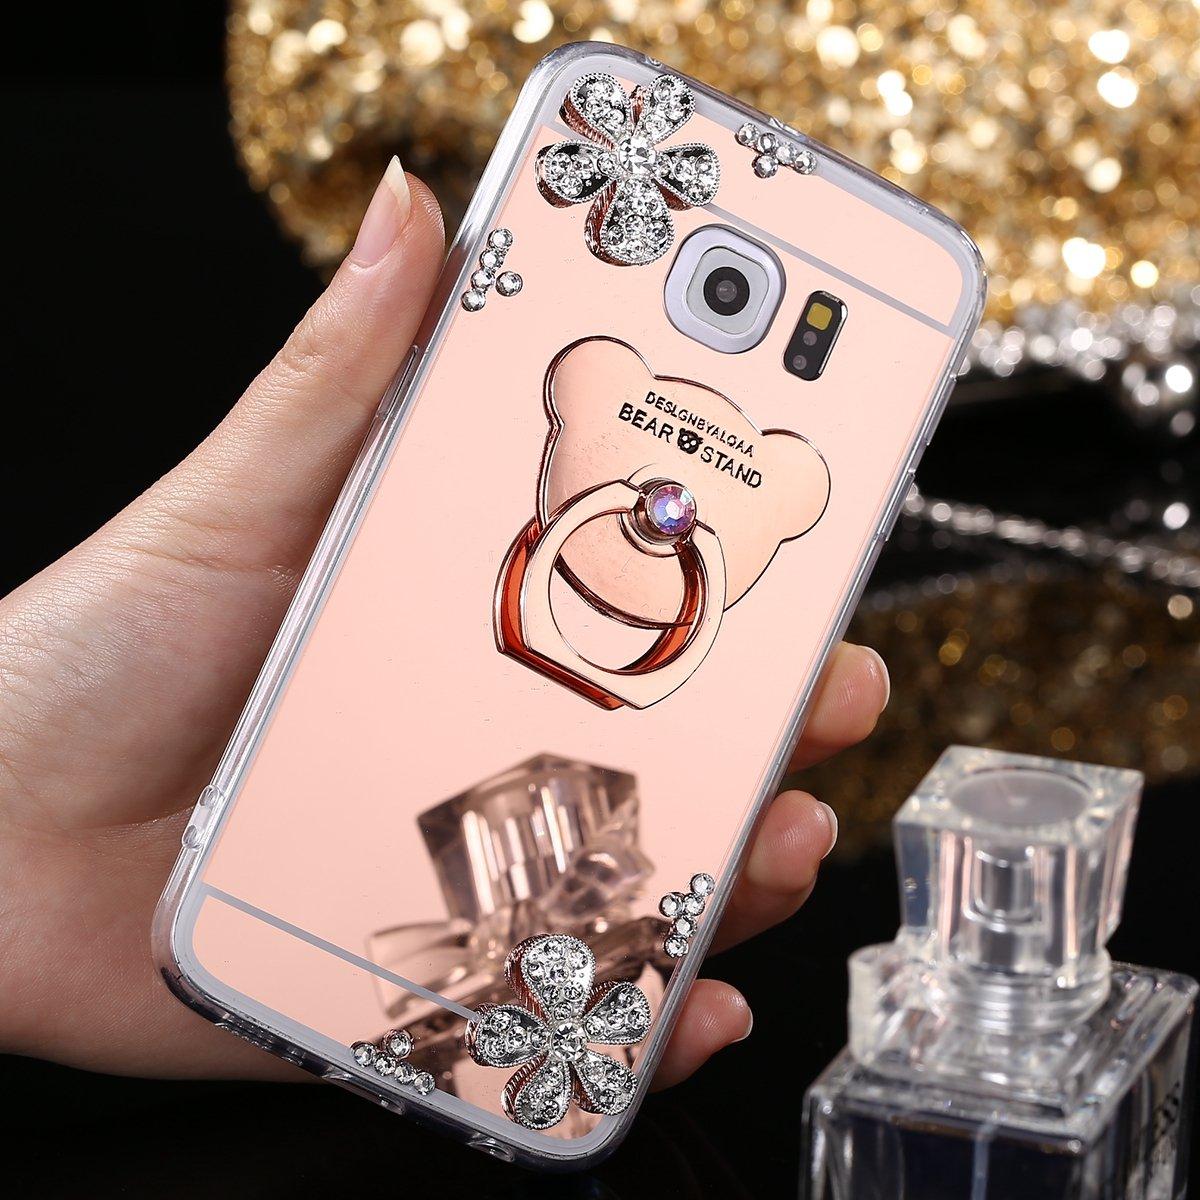 Coque Samsung Galaxy S6 Edge, EINFFHO Strass Floral Miroir Silicone Housse Étui pour Samsung Galaxy S6 Edge Case Cover [avec Ours Support Bague] Briller Rhinestone Diamant Maquillage Réfléchissant Placcatura Miroir Coque Samsung Galaxy S6 Edge Etui de Télé